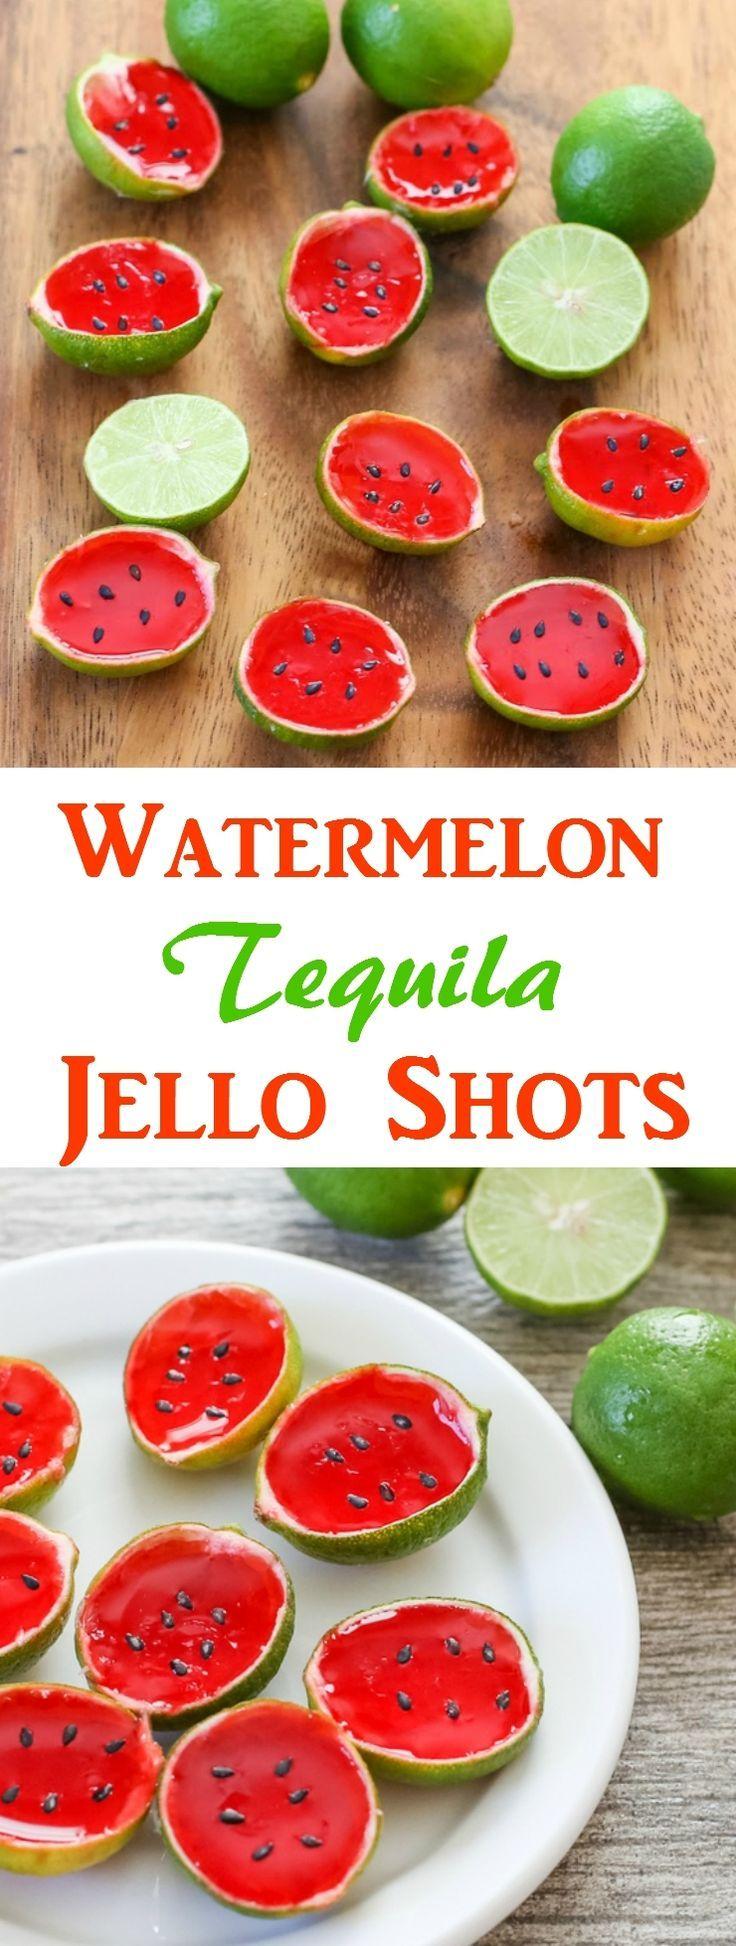 Watermelon Tequila Jello Shots   Kirbie's Cravings   A San Diego food & travel blog